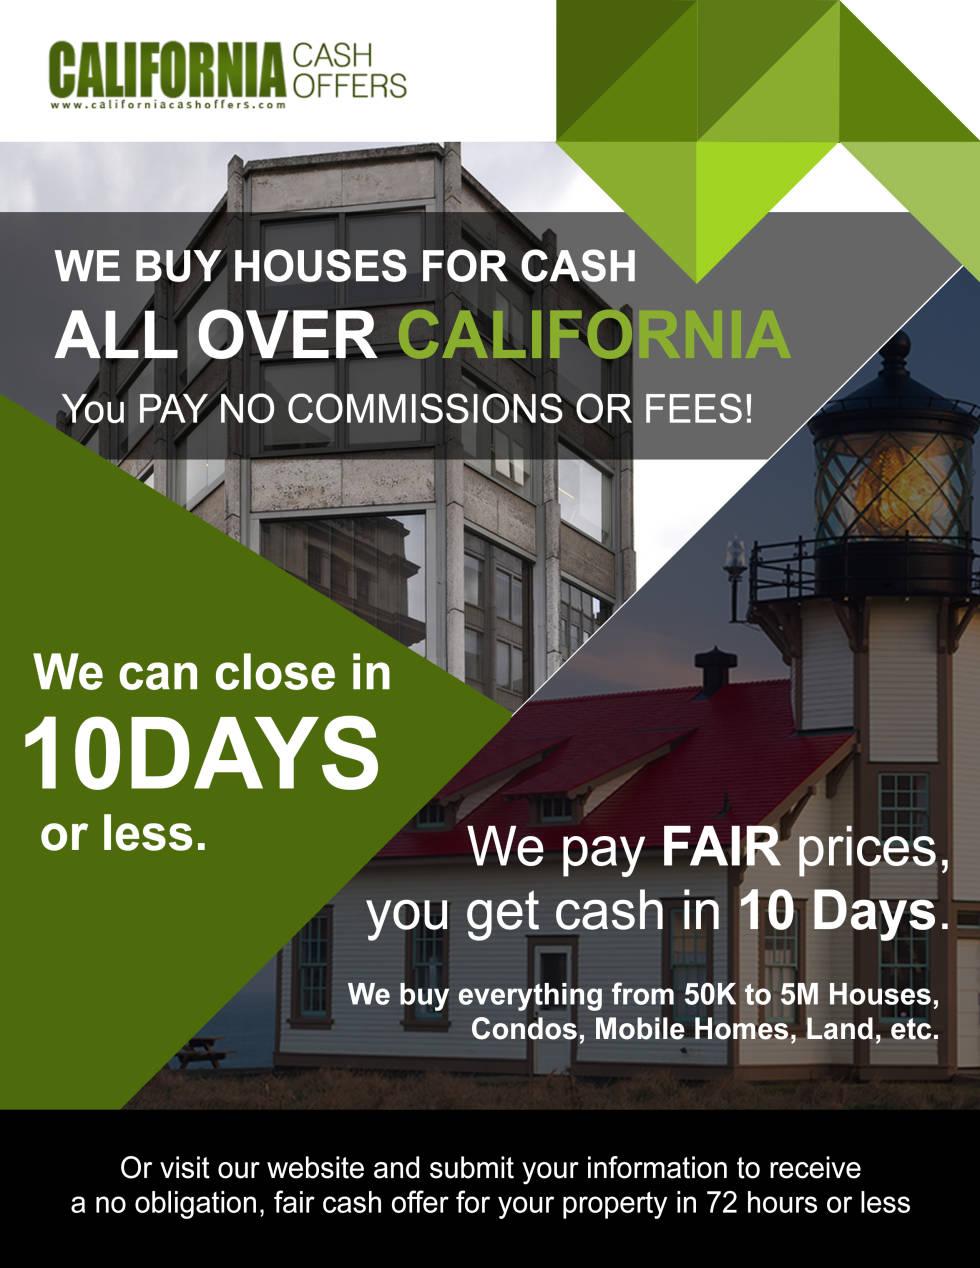 California Cash Offers website